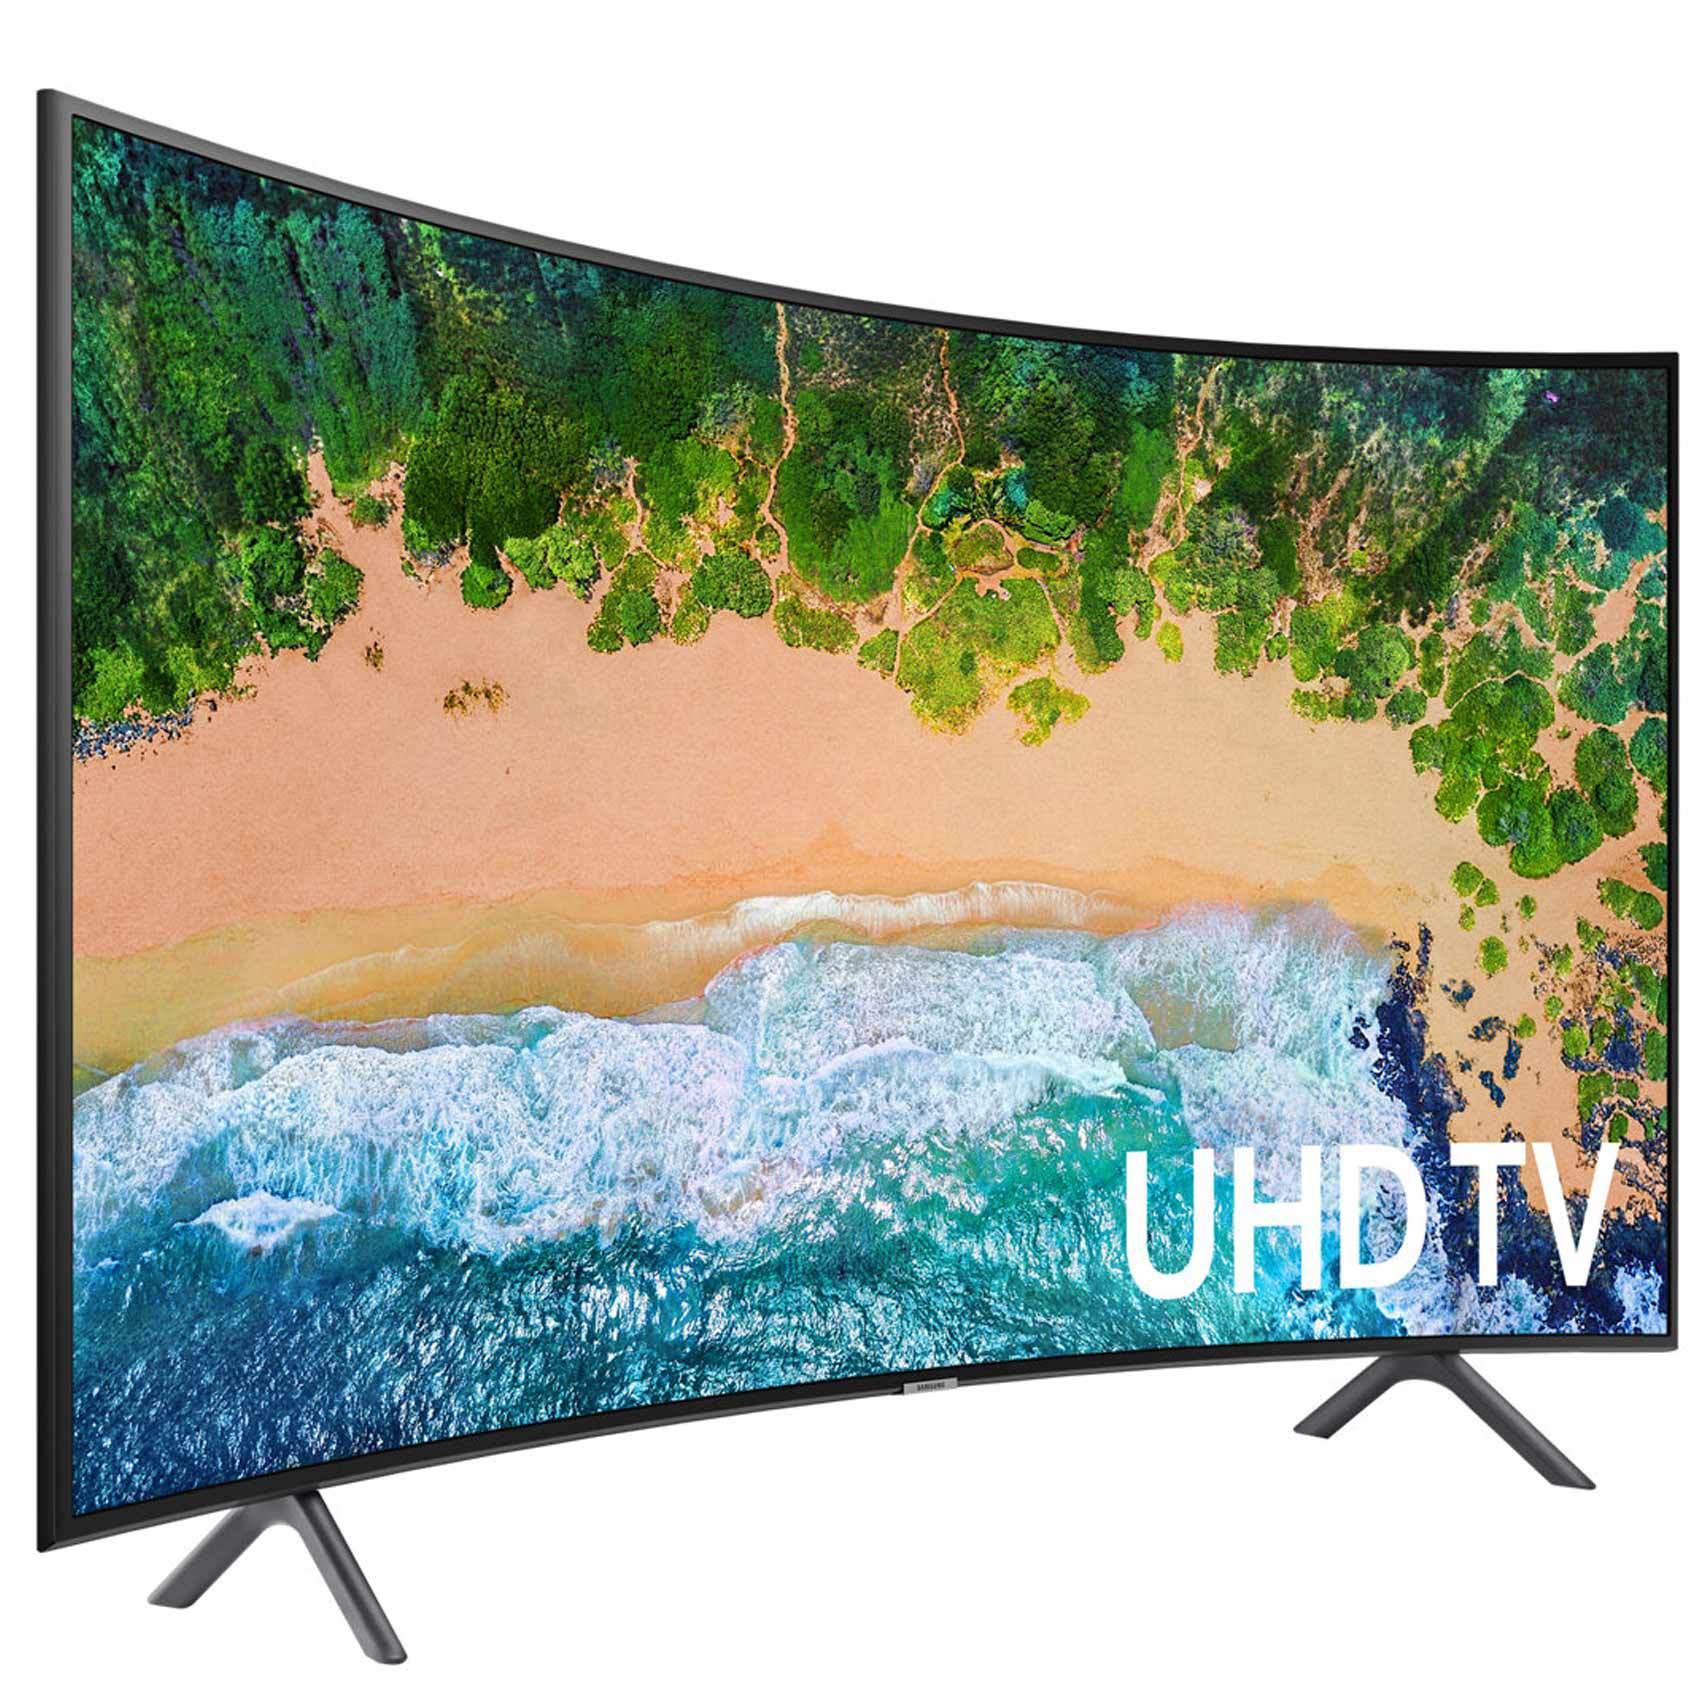 SAMSUNG CURVED UHD TV 49